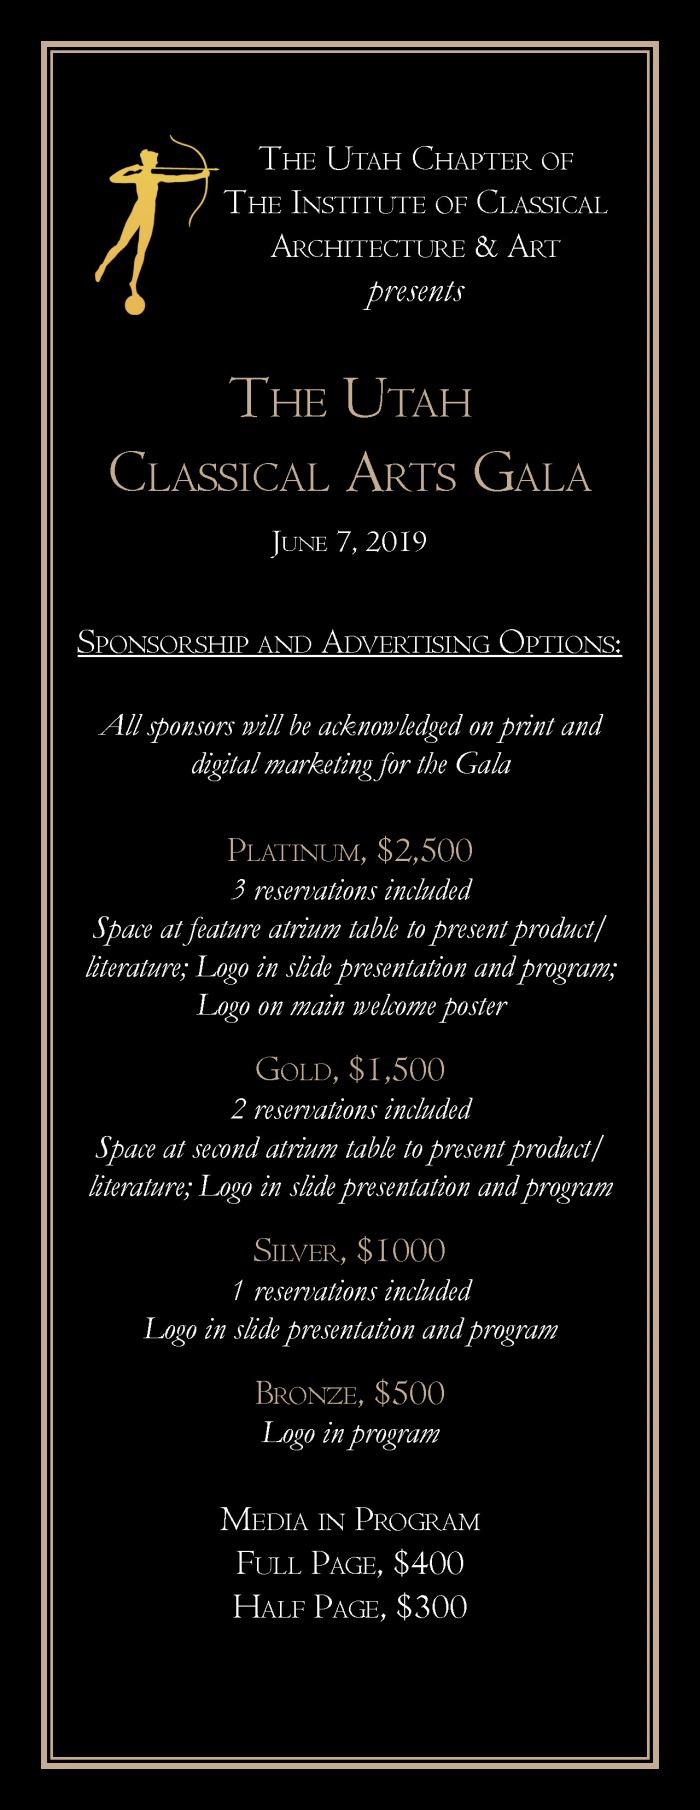 2019 ICAA Classical Arts Gala Sponsorships